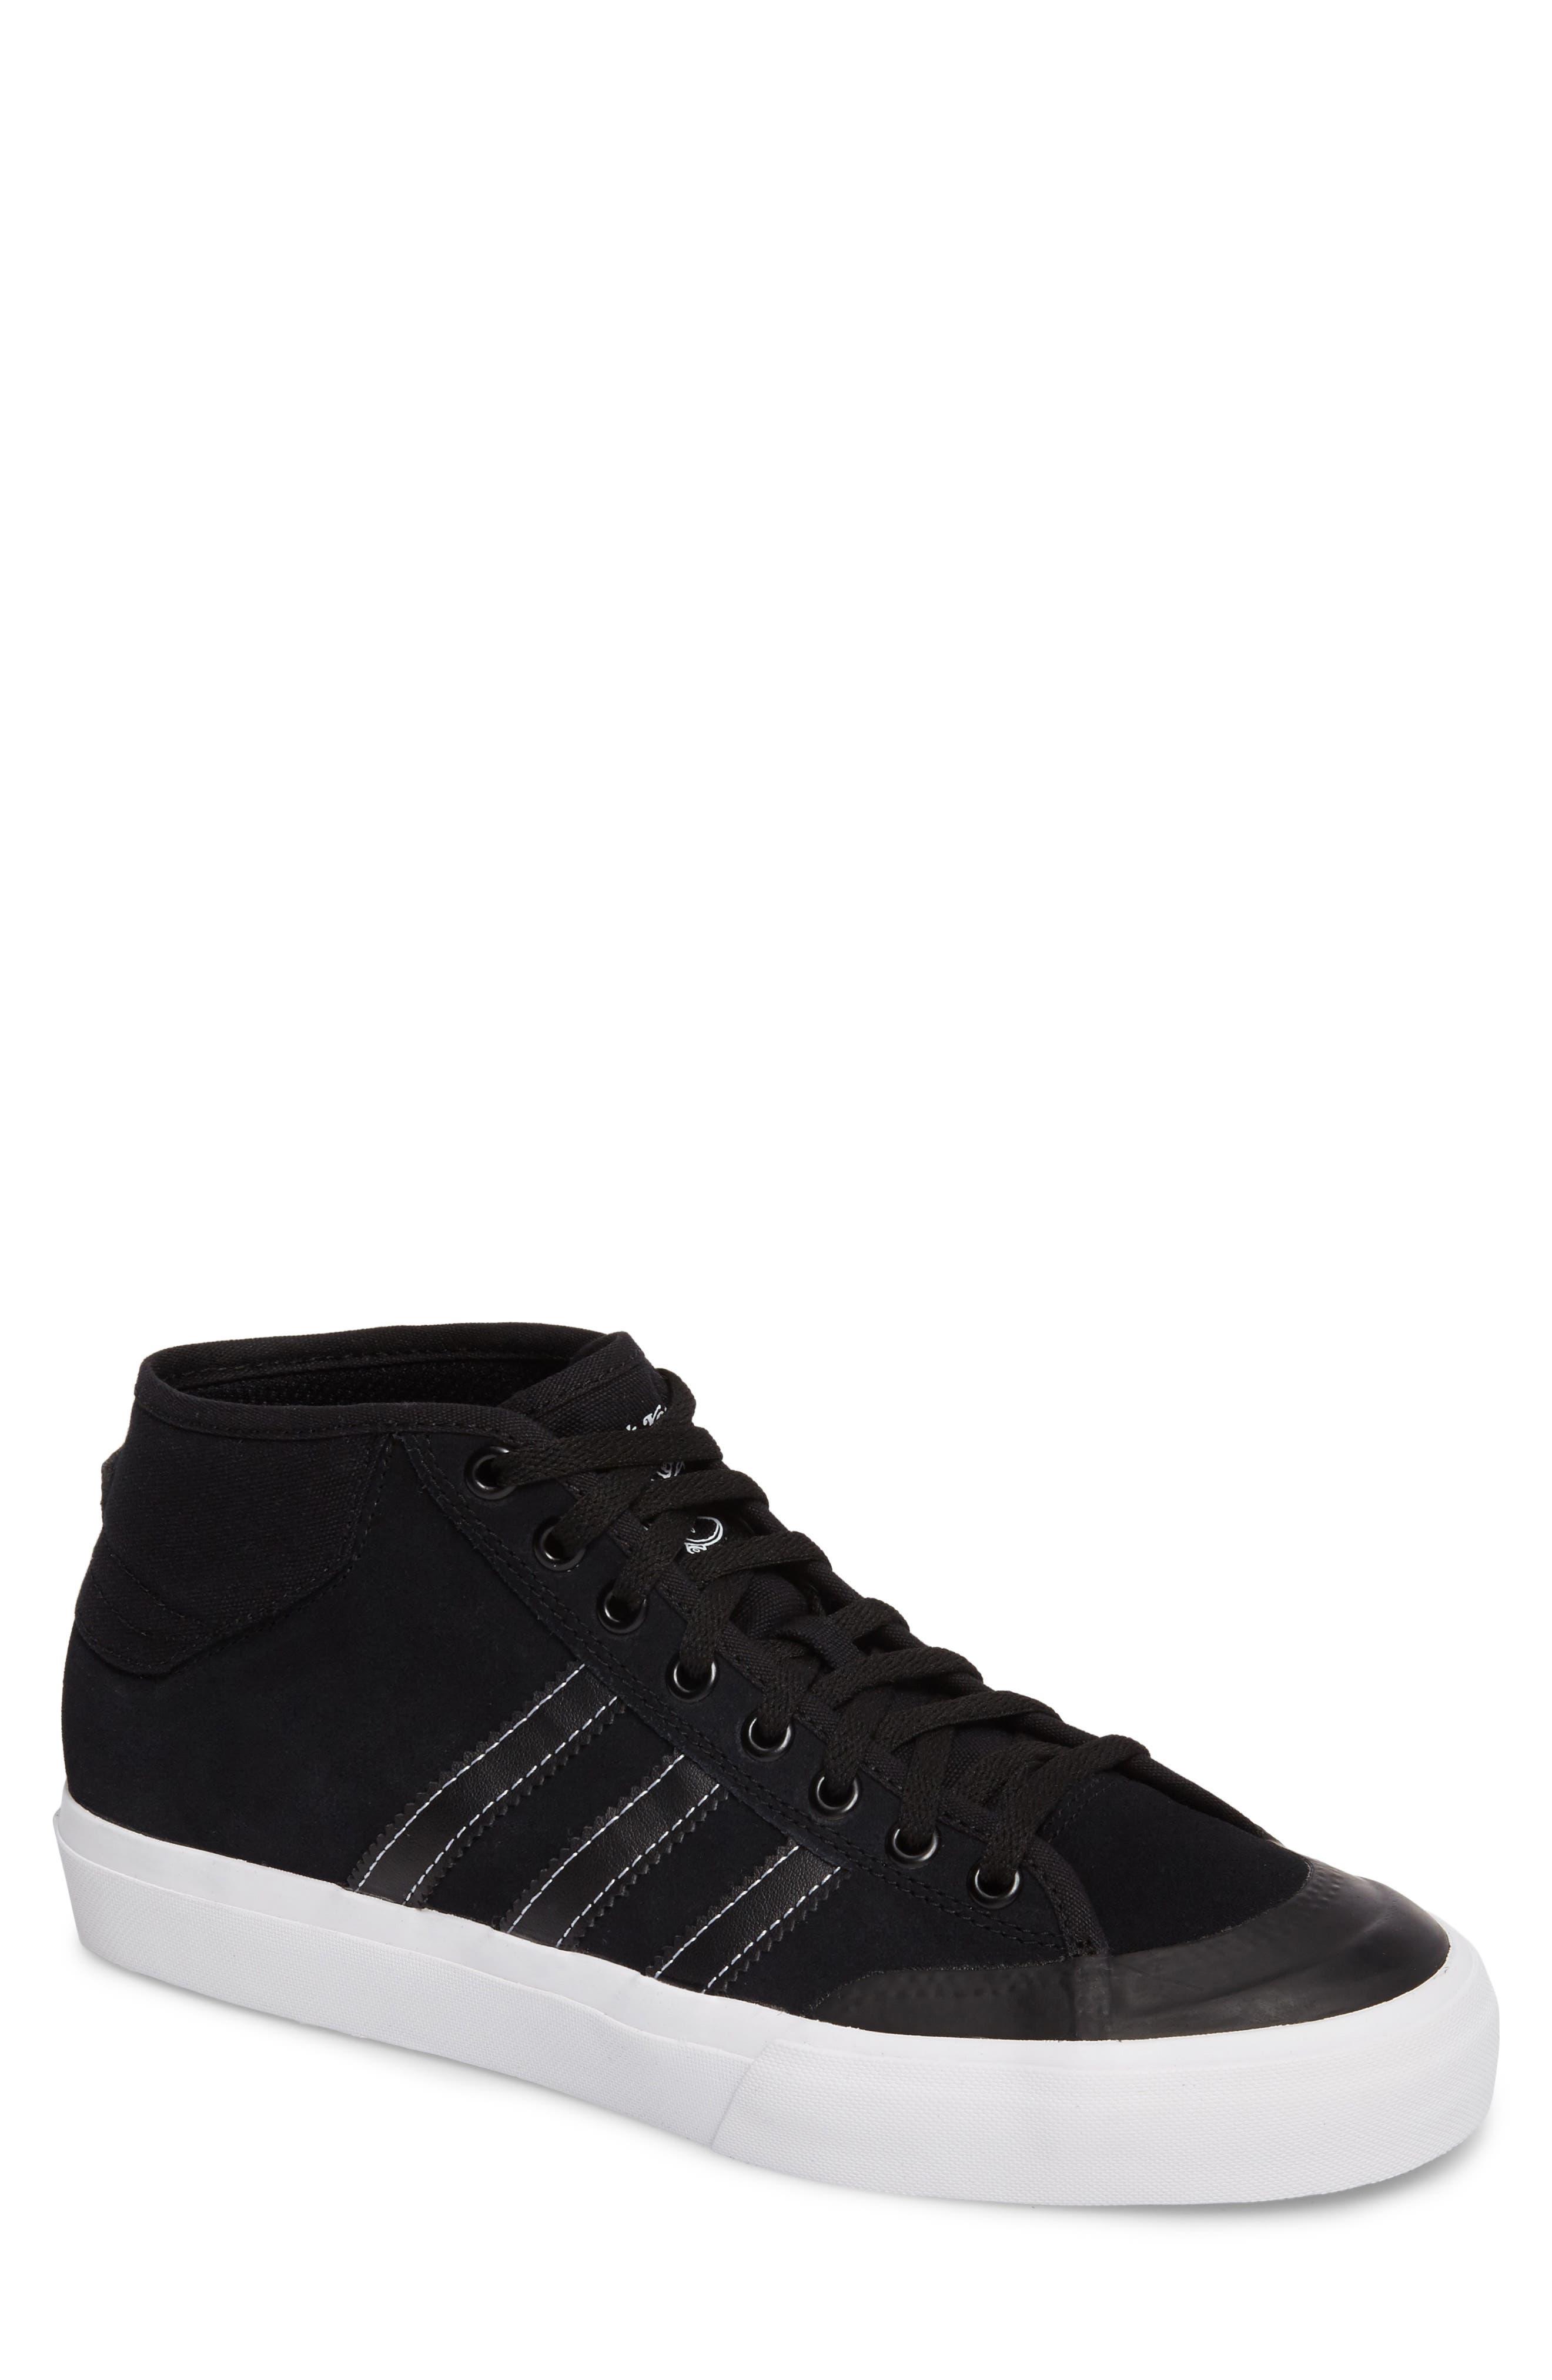 Matchcourt Mid ADV Sneaker,                             Main thumbnail 1, color,                             001